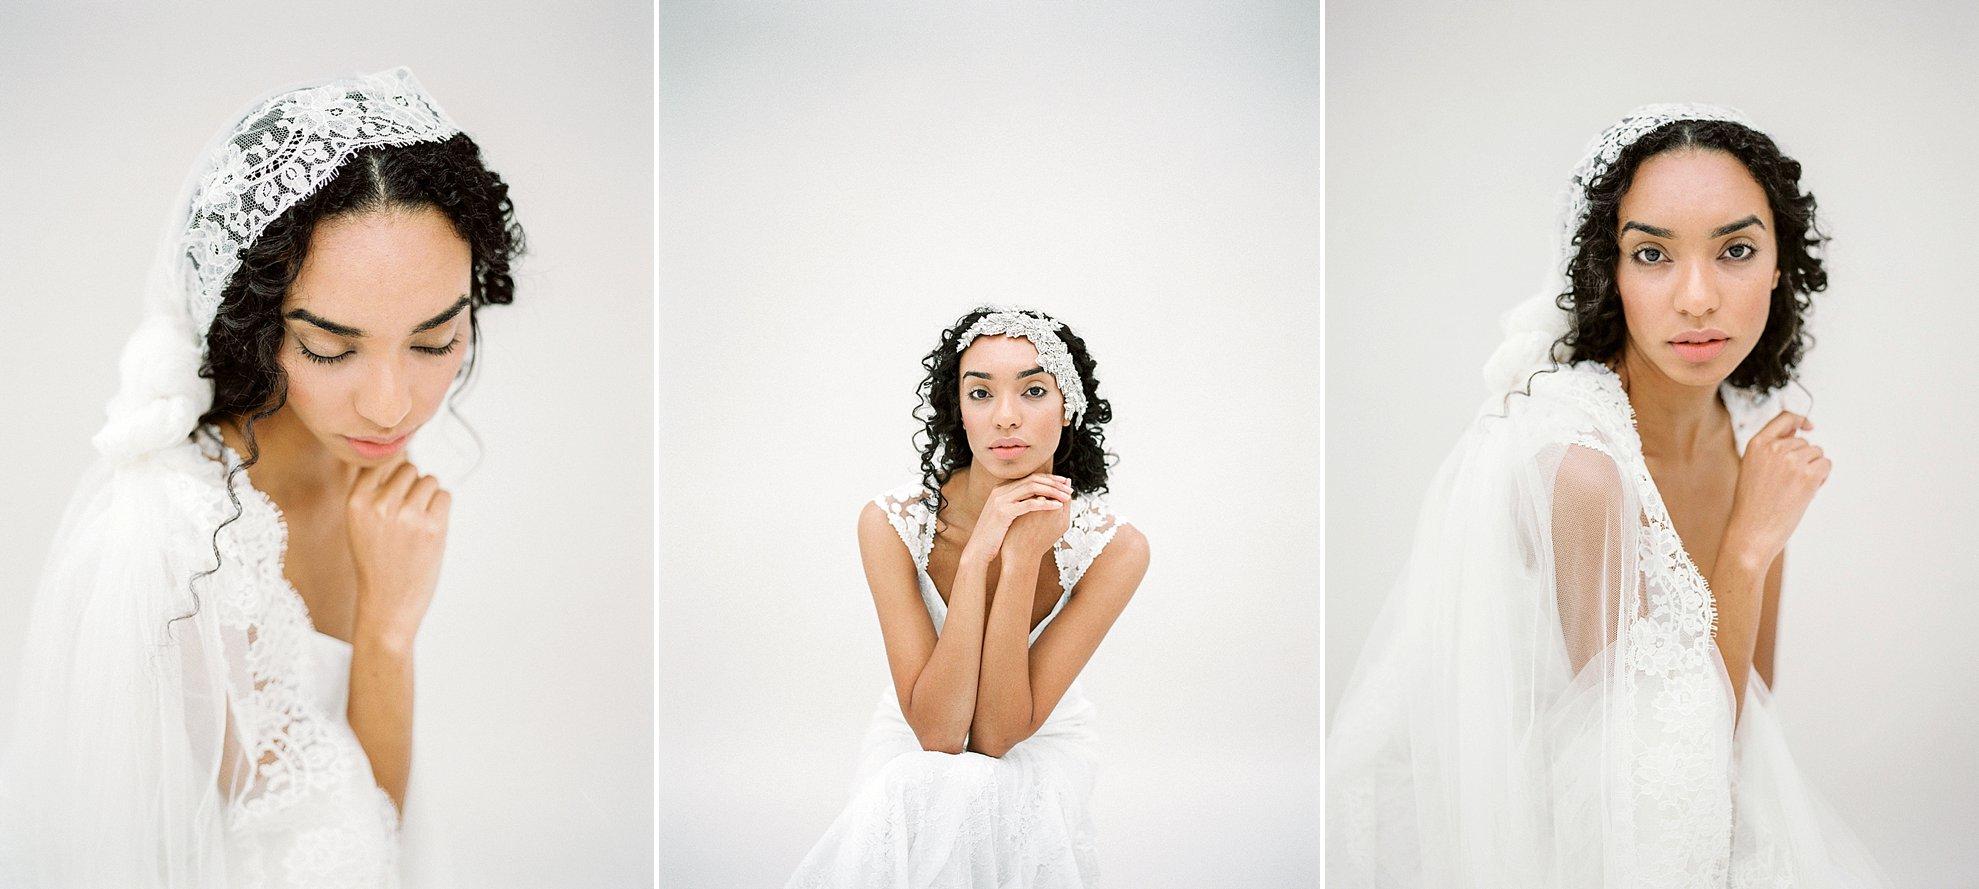 Amanda-Drost-Fotografie-mode-fashion-editorial-bridal_0010.jpg